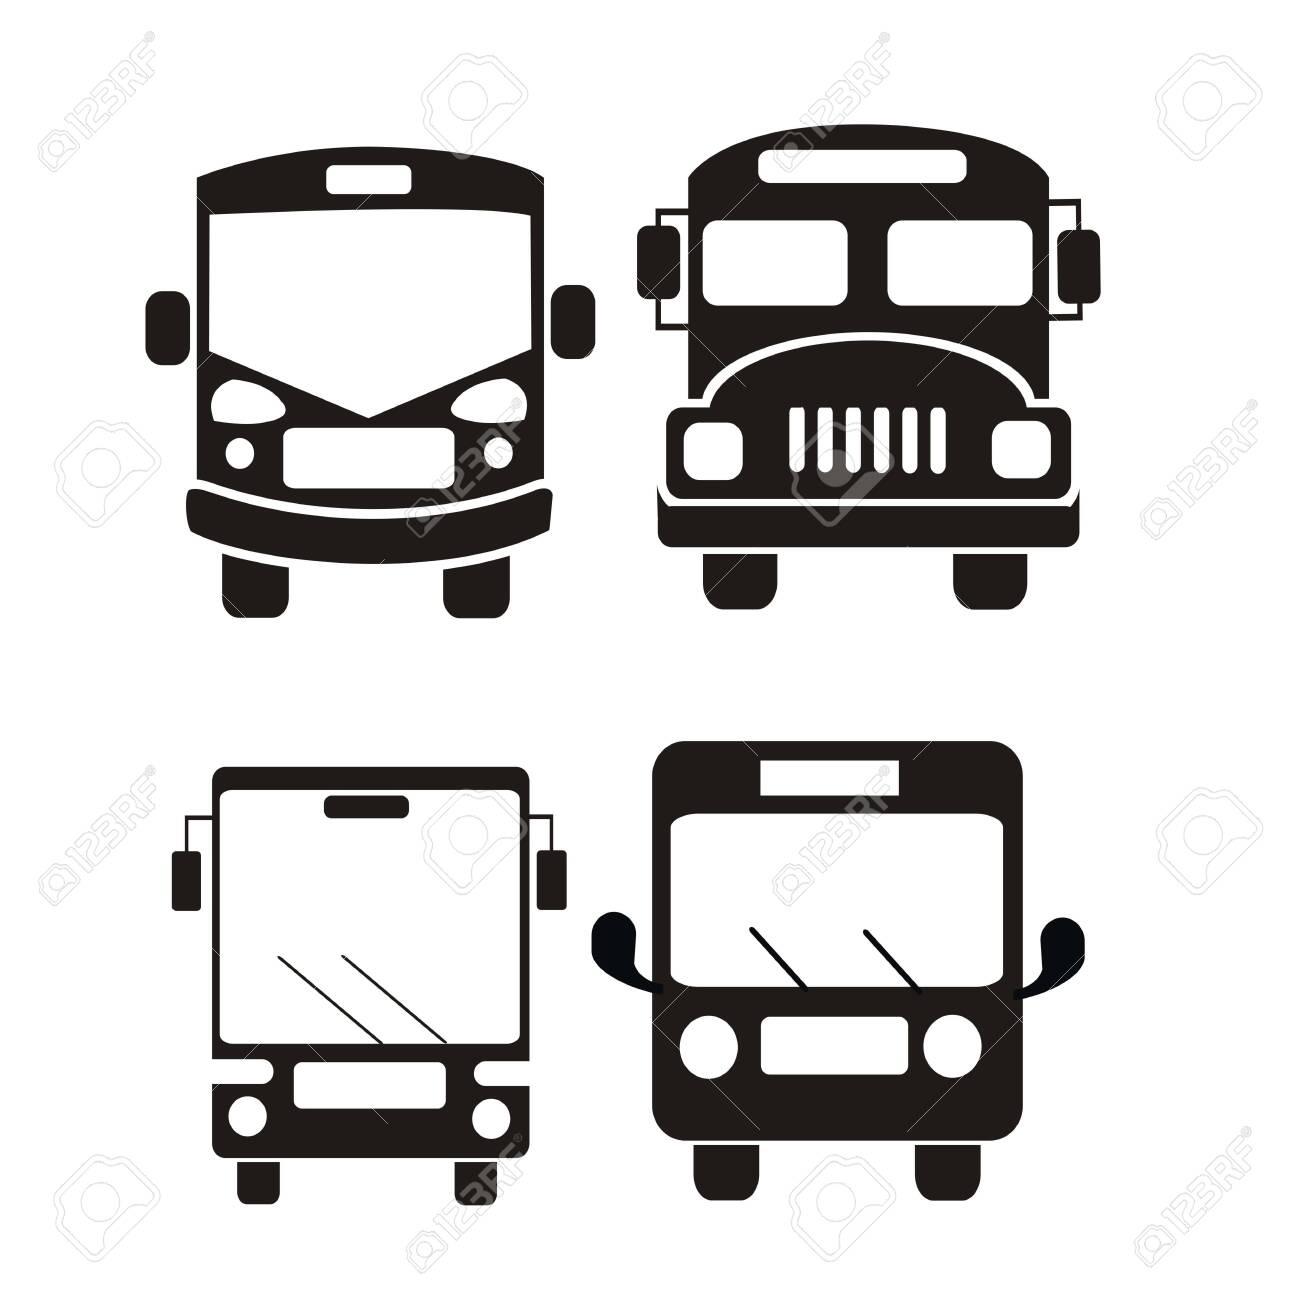 bus icon set vector illustration - 124535983